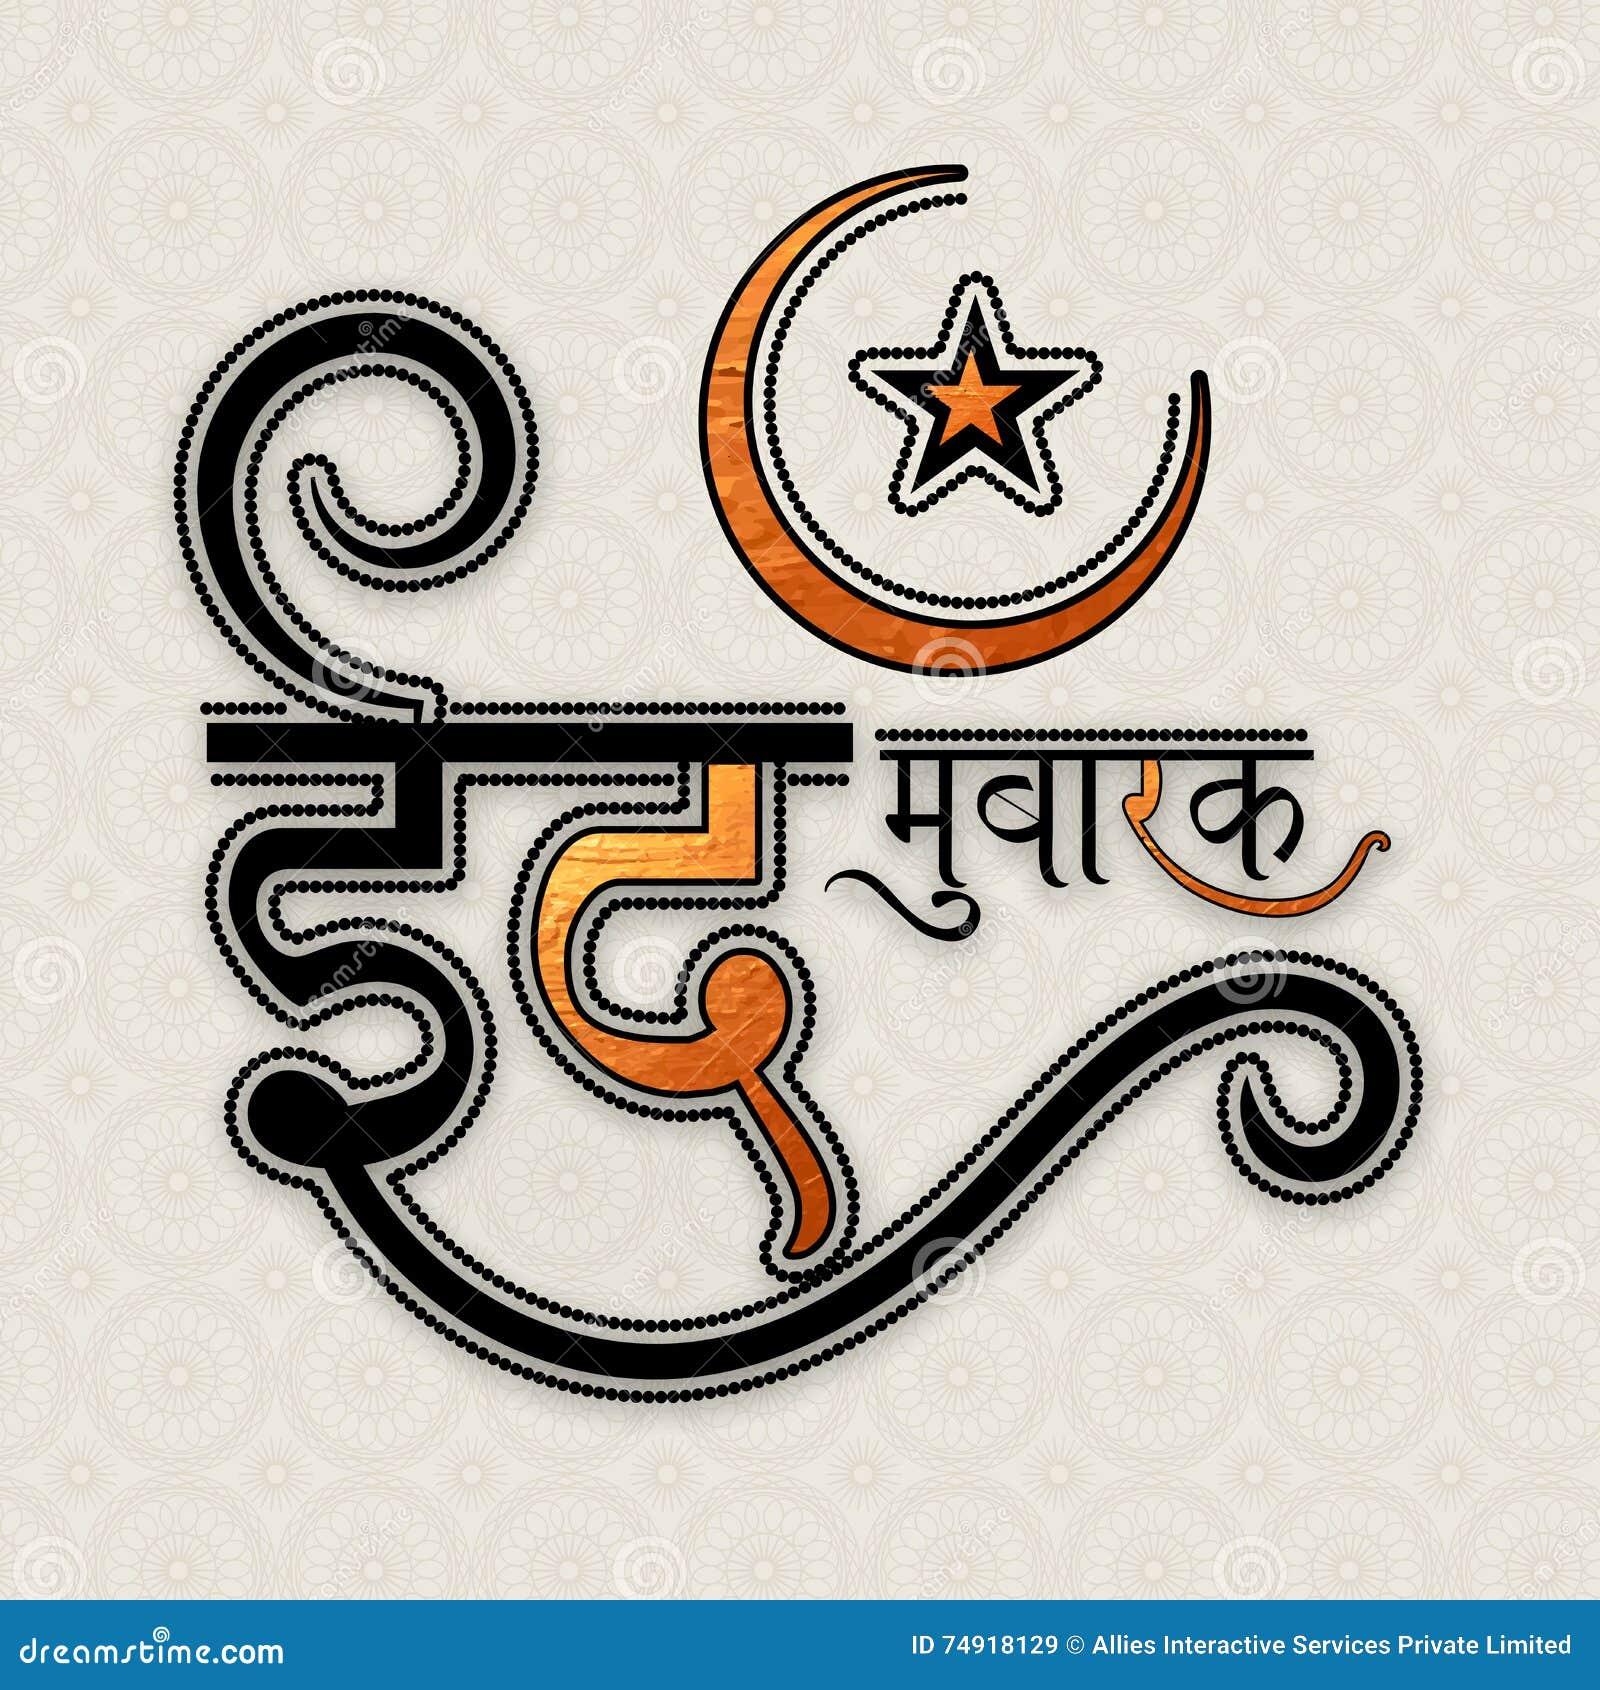 Greeting Card With Hindi Text For Eid Mubarak Illustration 74918129